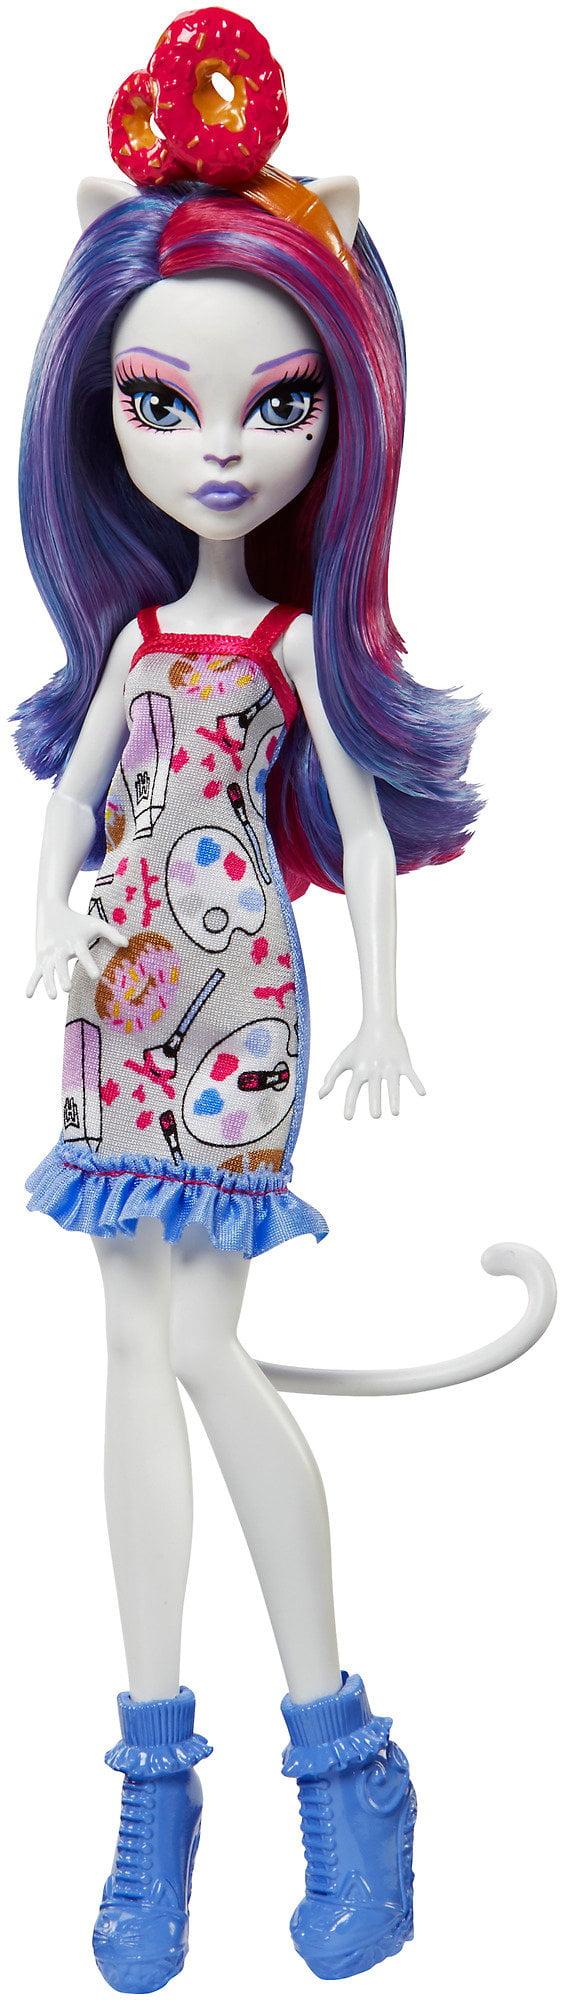 Monster High Catrine Demew Doll by Mattel